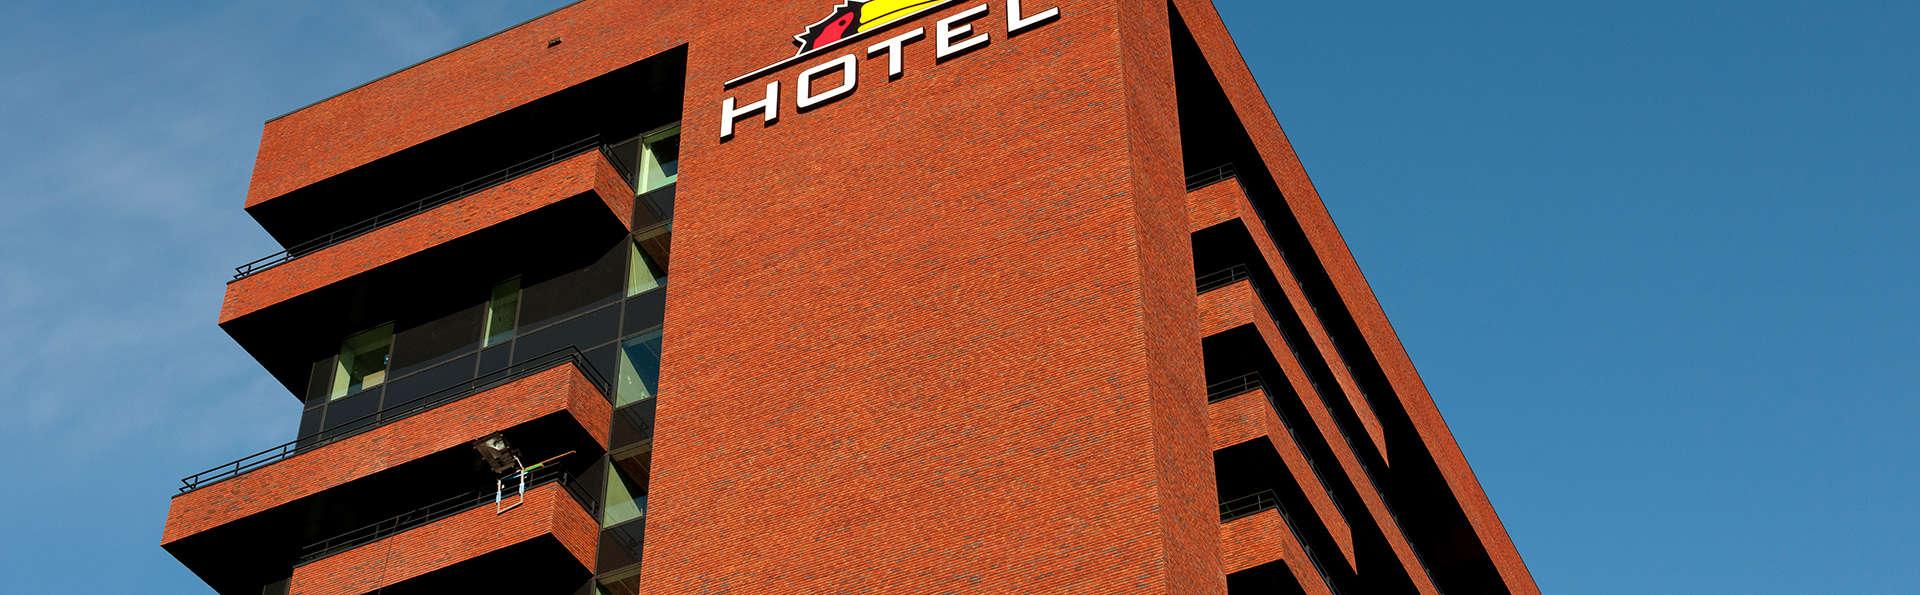 Van der Valk Hotel Enschede - EDIT_NEW_front1.jpg